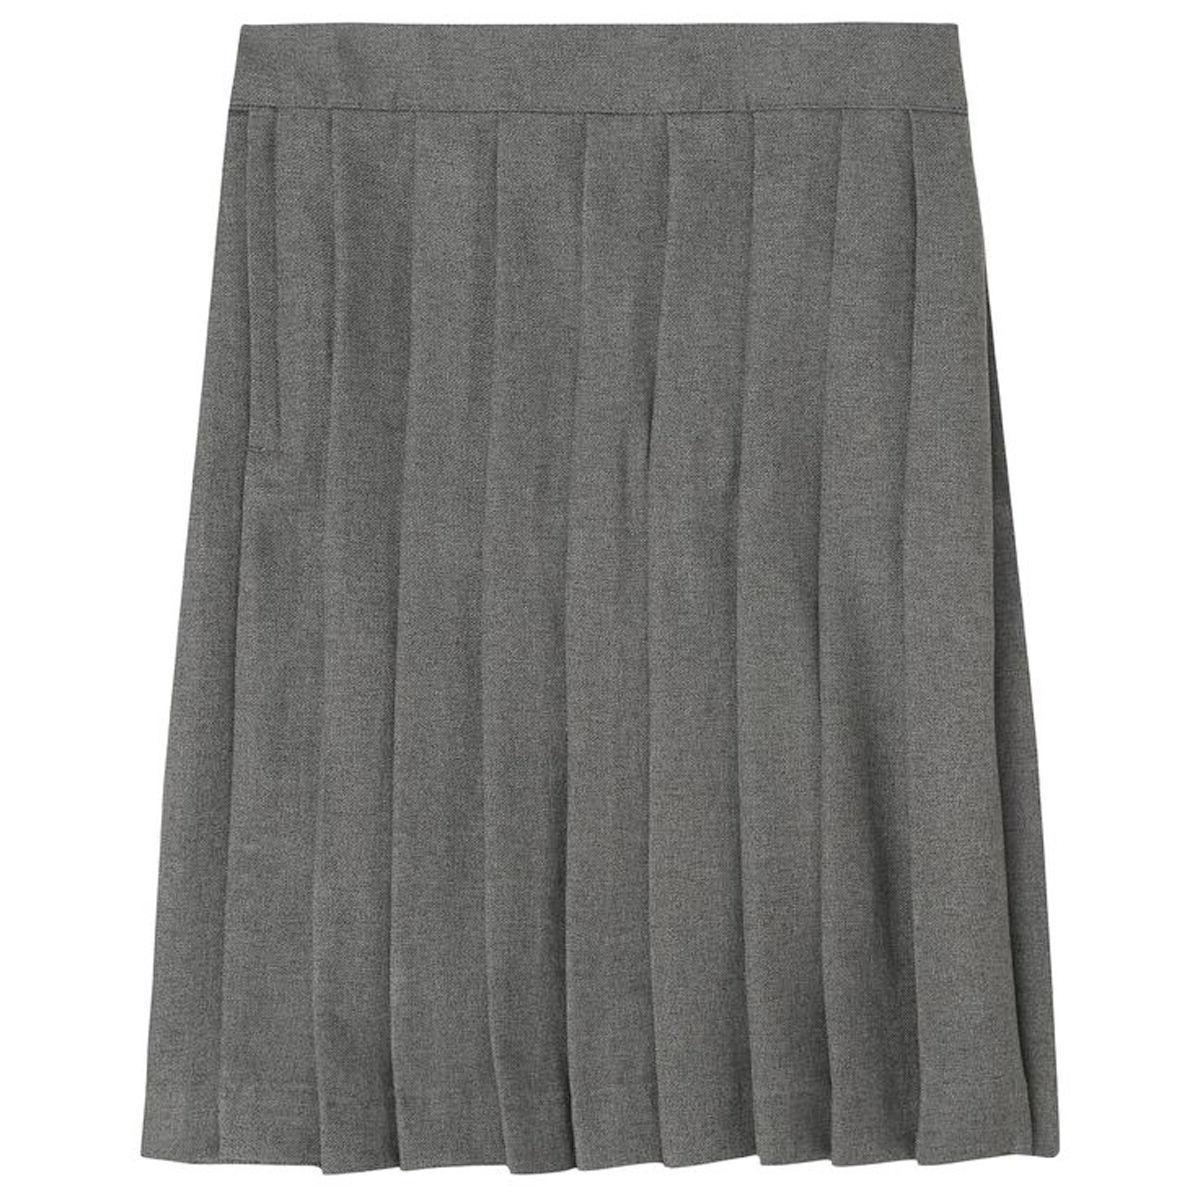 Girls Gray Pleated Skirt French Toast School Uniform Sizes 4